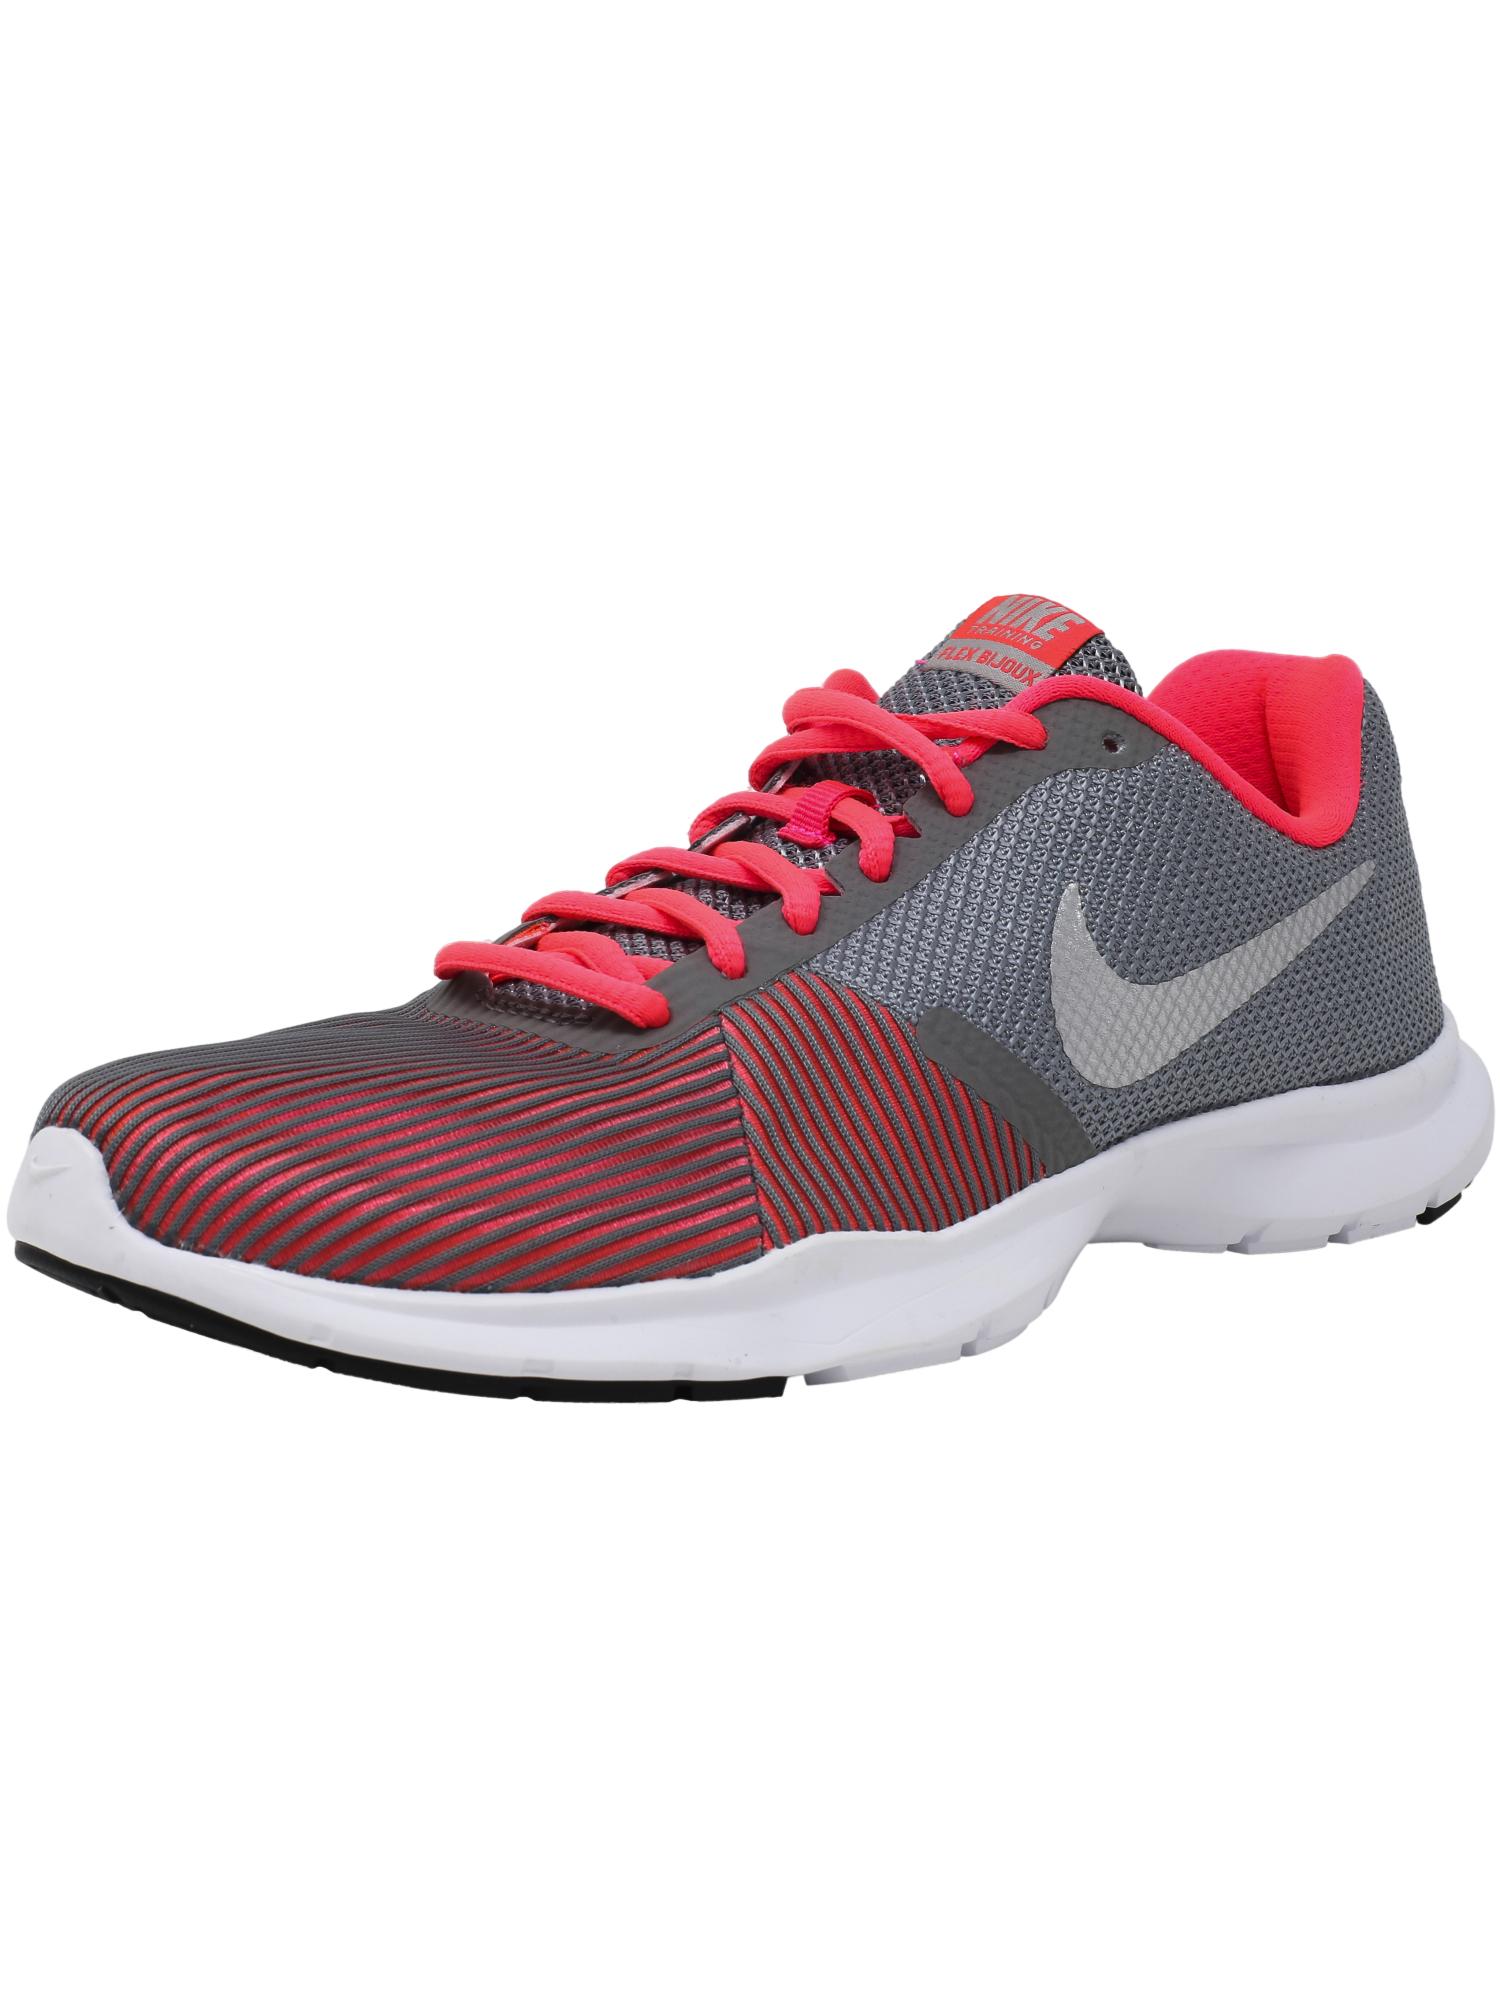 Nike femmes femmes Nike Flex Bijoux Ankle-High Training Chaussures 8075f3